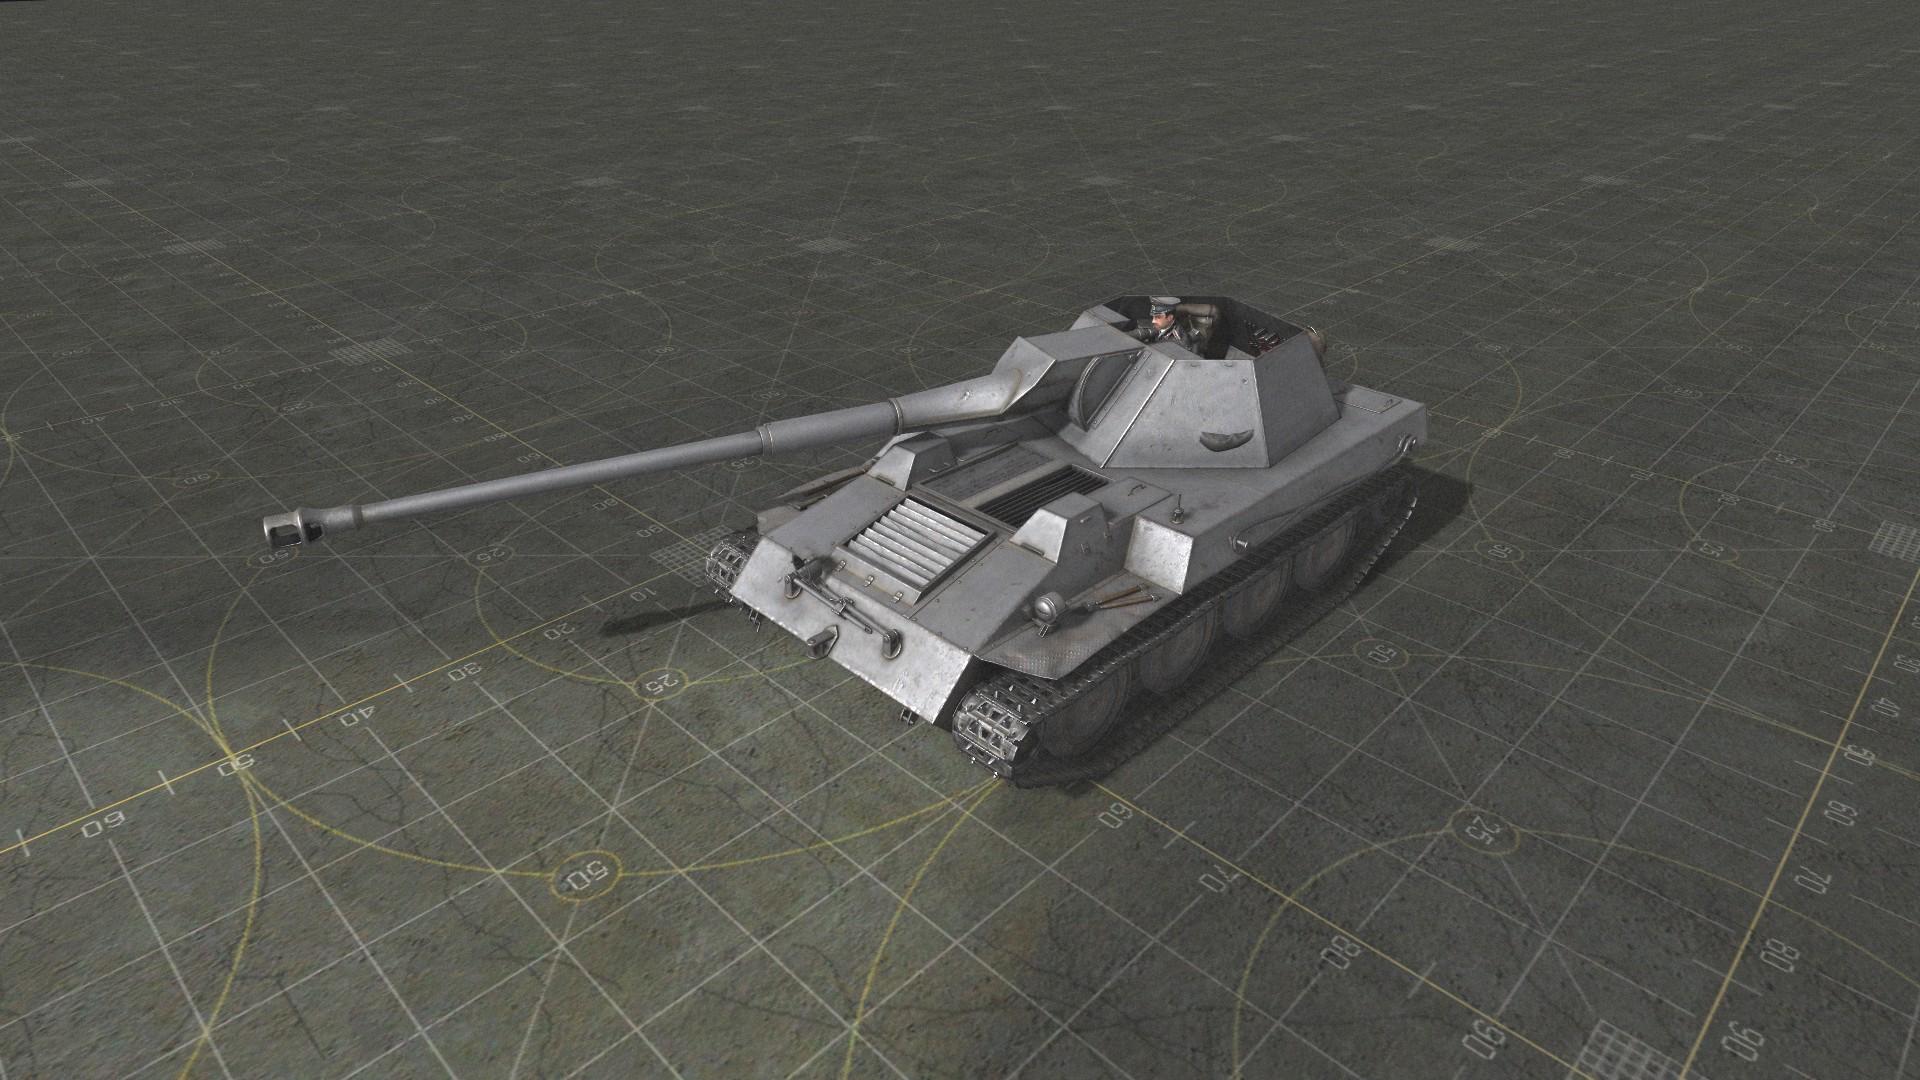 Скачать Krupp-Steyr Waffenträger [vlss] [Standalone] (AS2 — 3.262.0) (v03.11.2018) — бесплатно